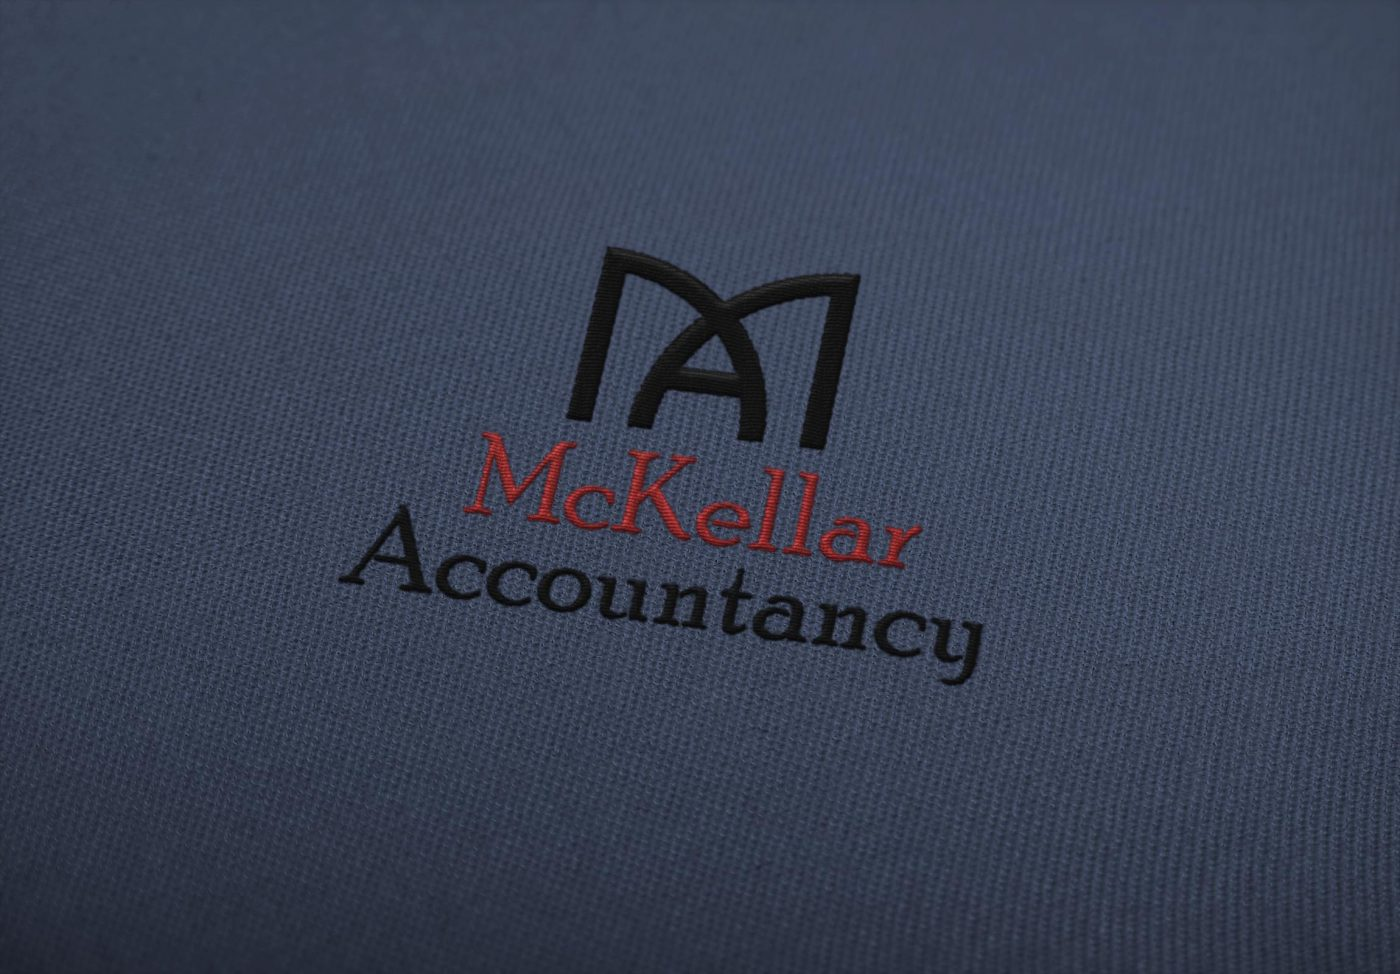 embroidered logo mockup dg mckellar accountancy